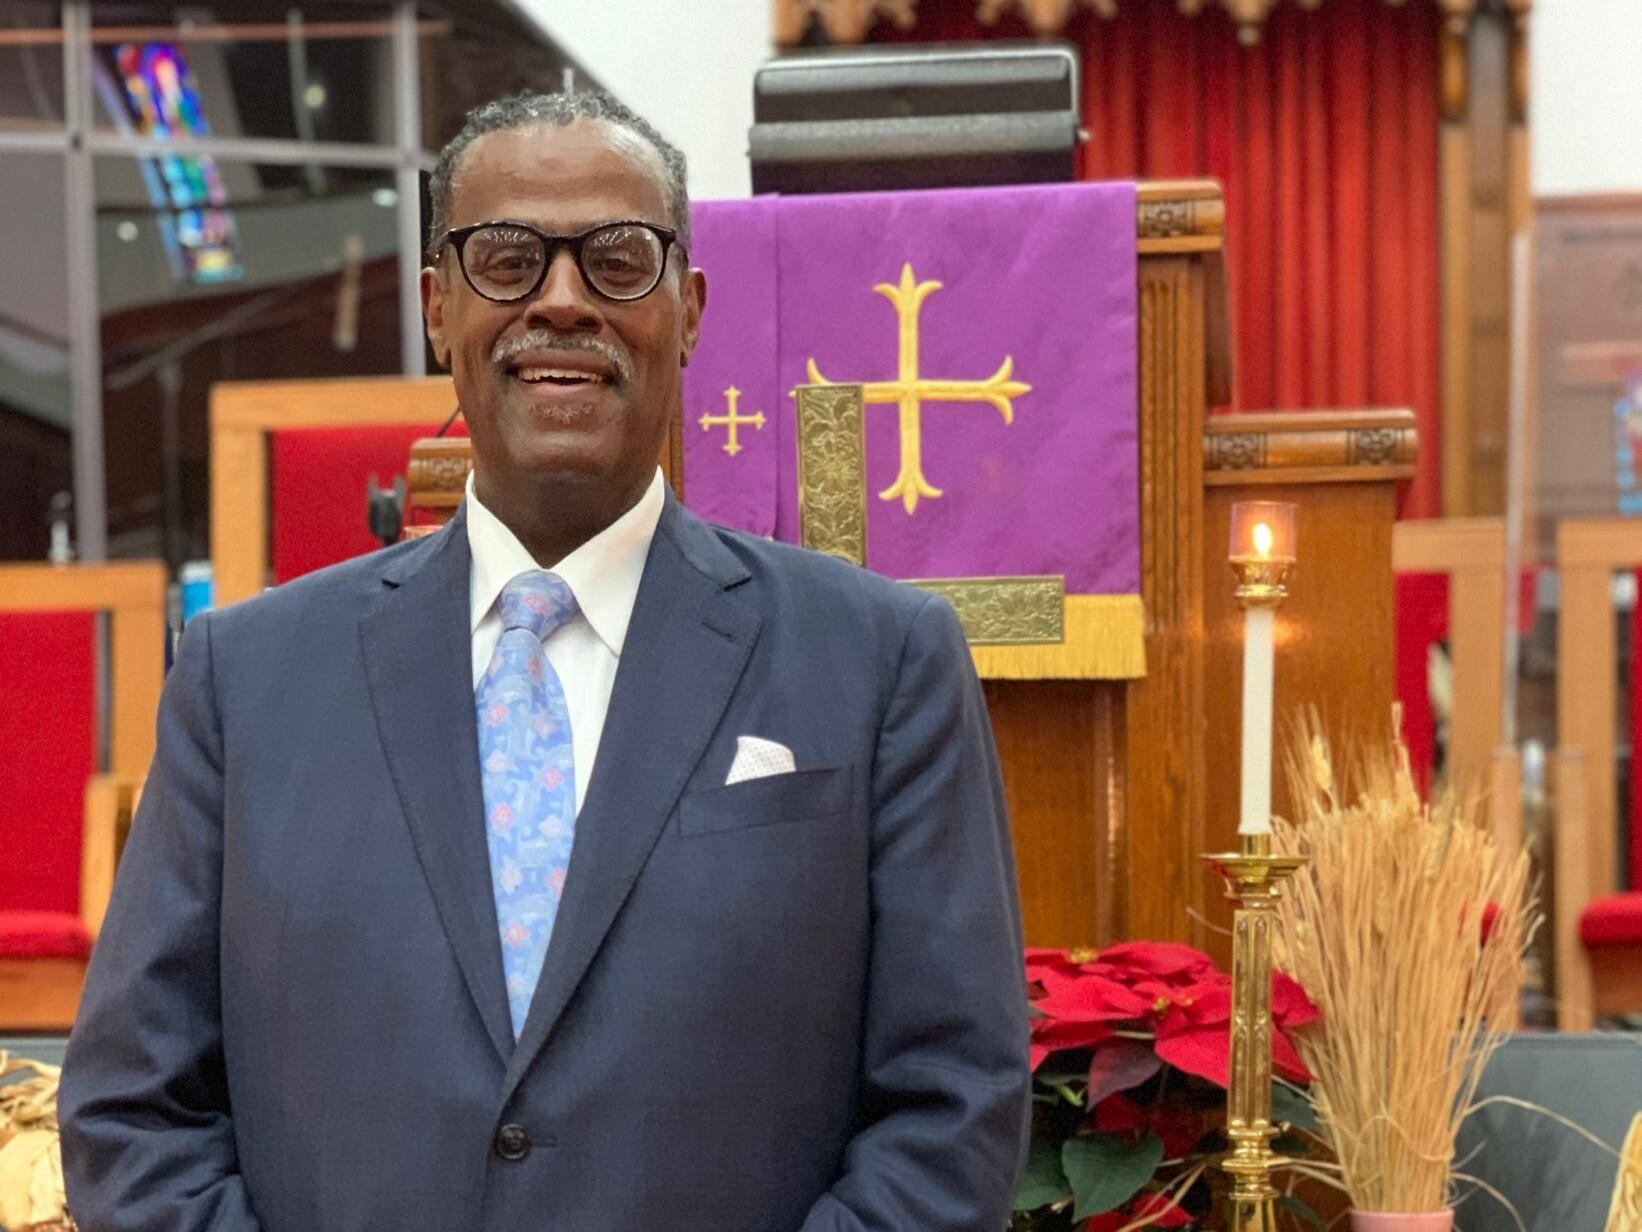 Rev. Dr. Silvester Beaman of Bethel AME Church